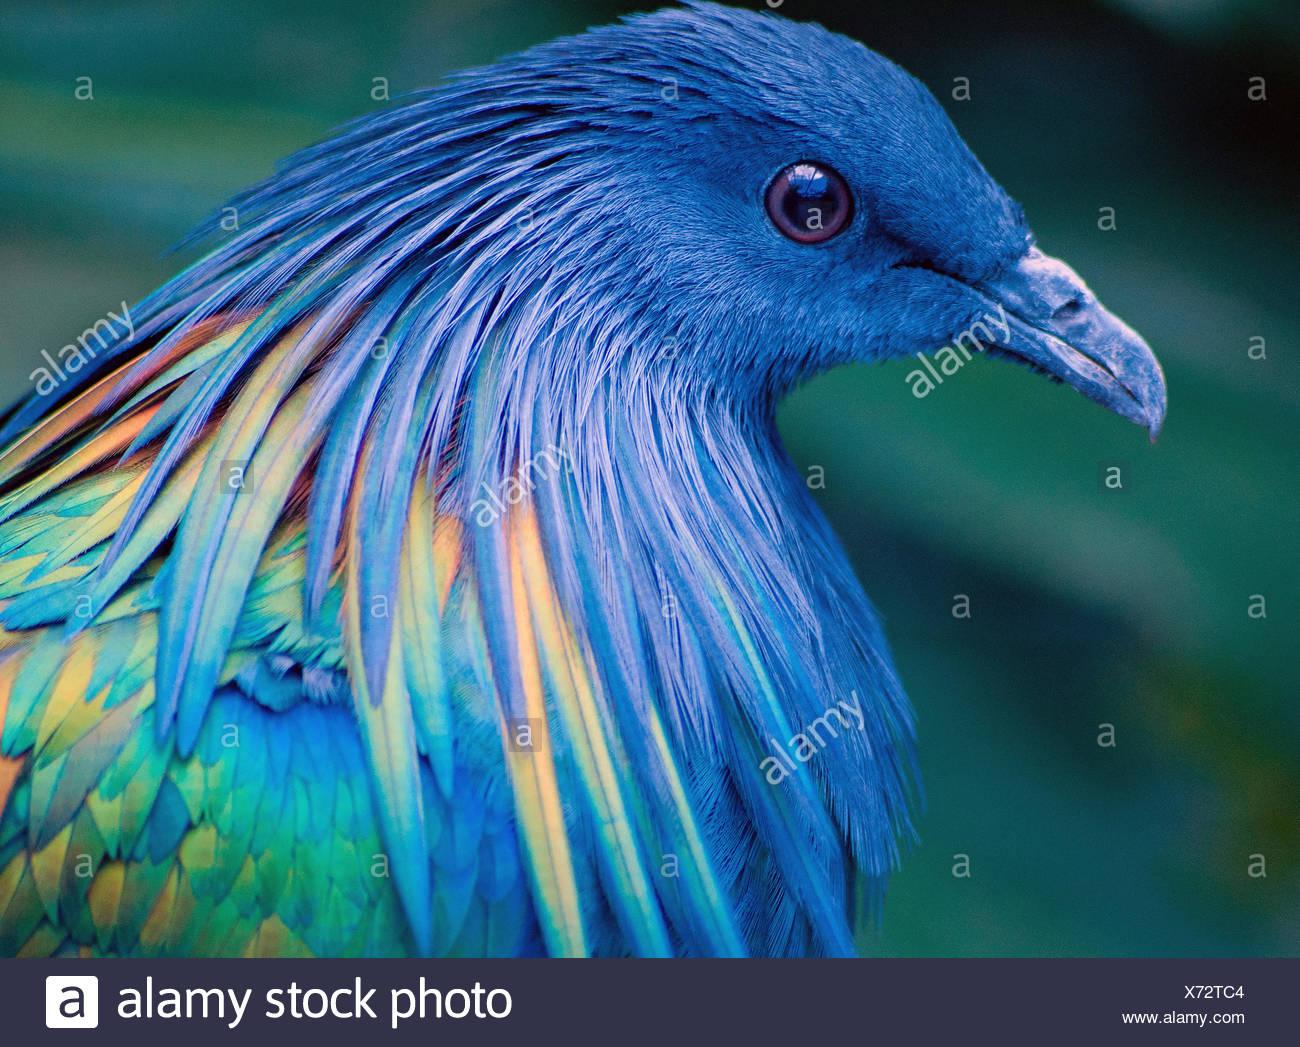 Nicobar Pigeon, South Africa - Stock Image